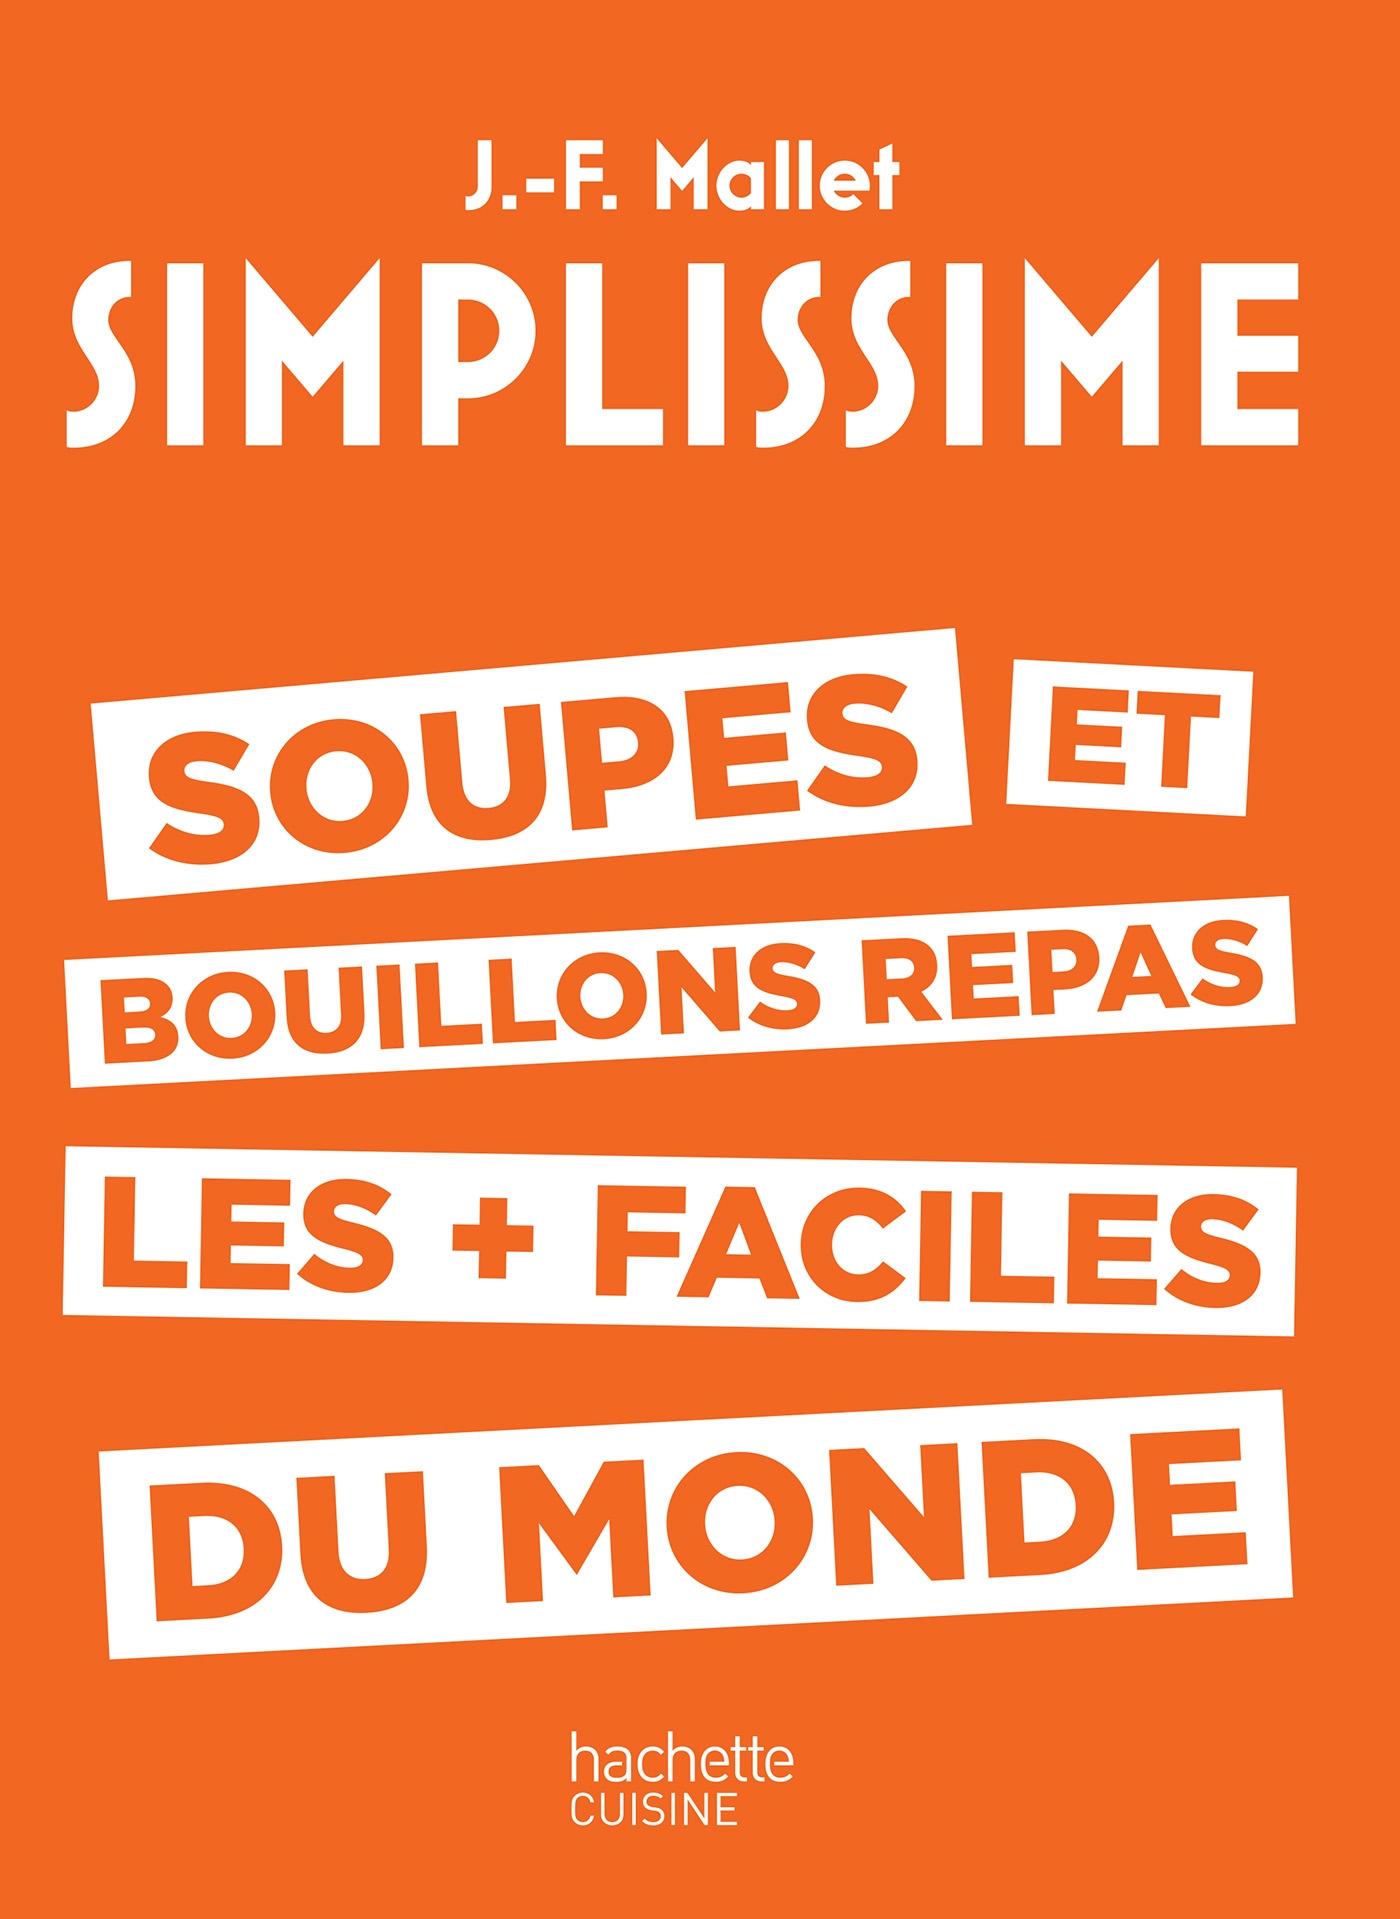 simplisime-bouillons-top-topic